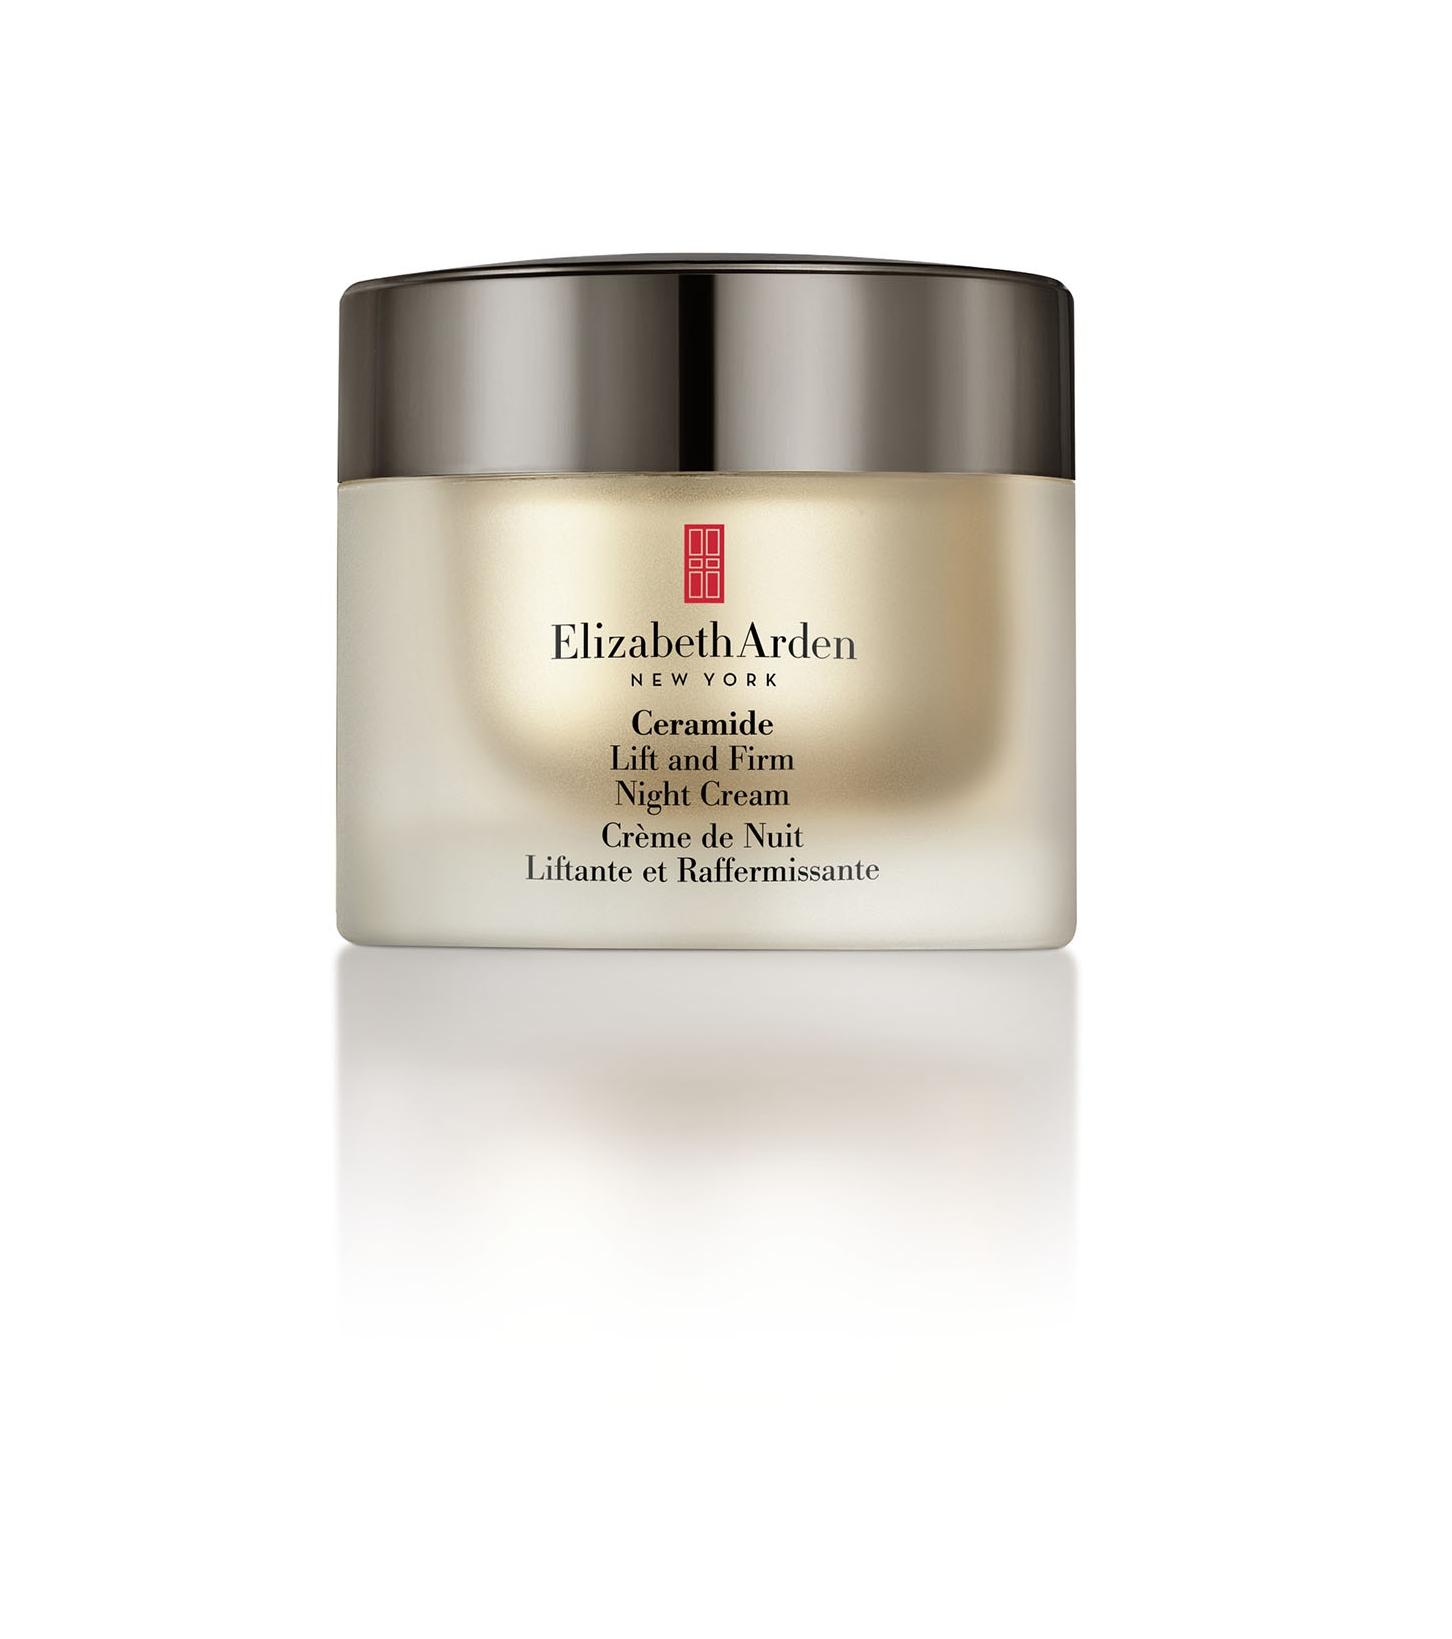 Elizabeth Arden  Ceramide Lift and Firm Night Cream, $151.